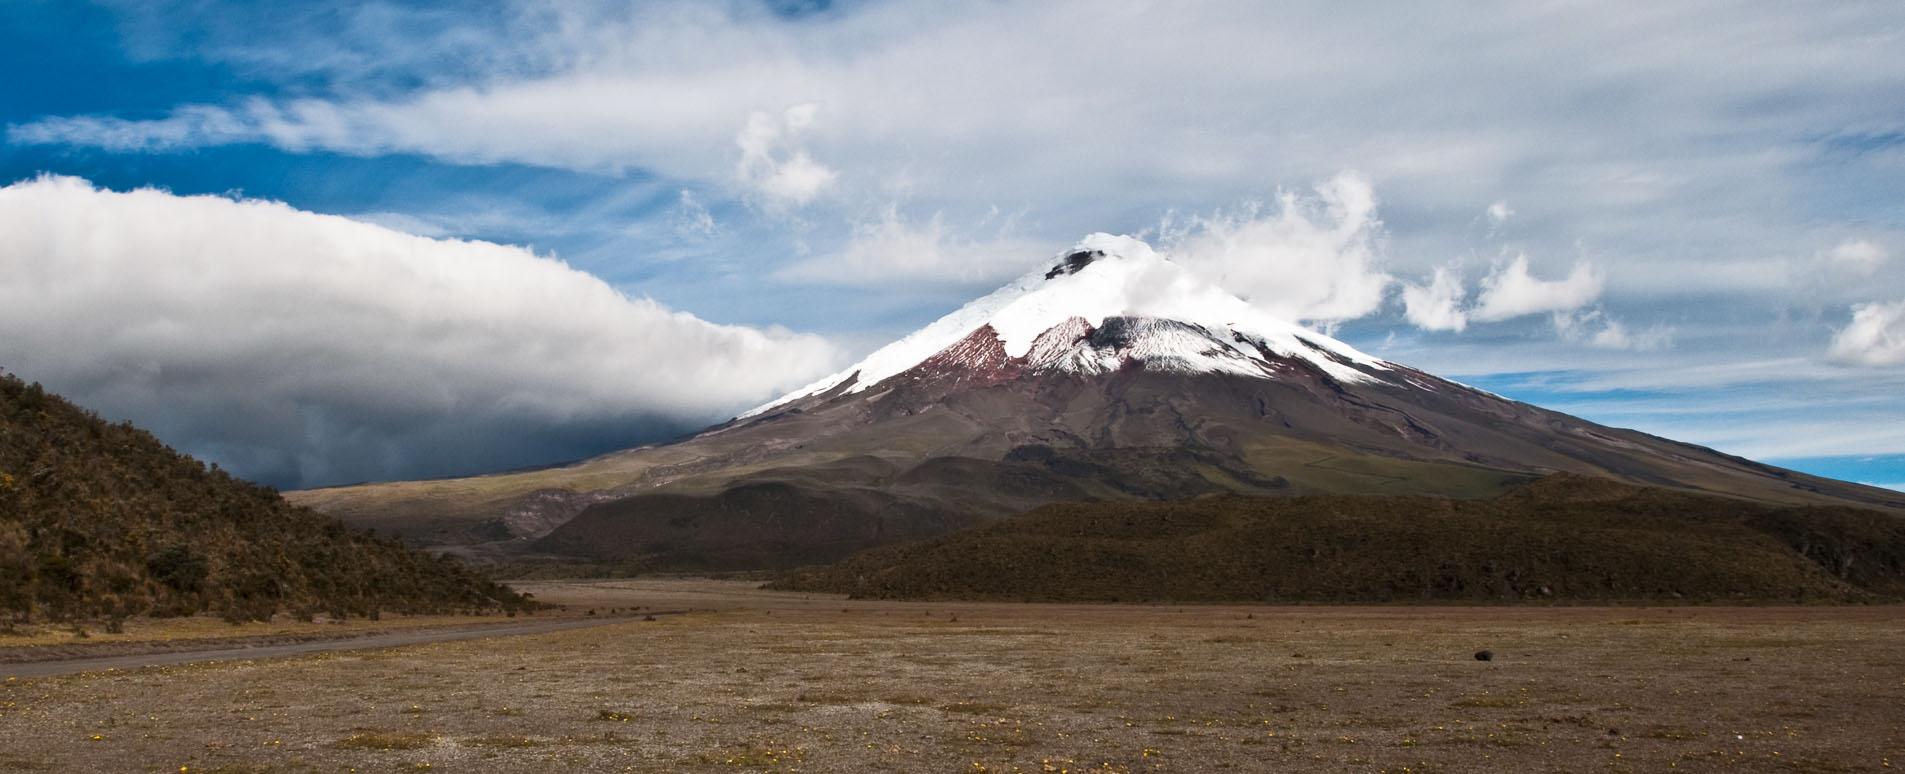 Visit The Central Andes Ecuador Travel GuideGeodyssey